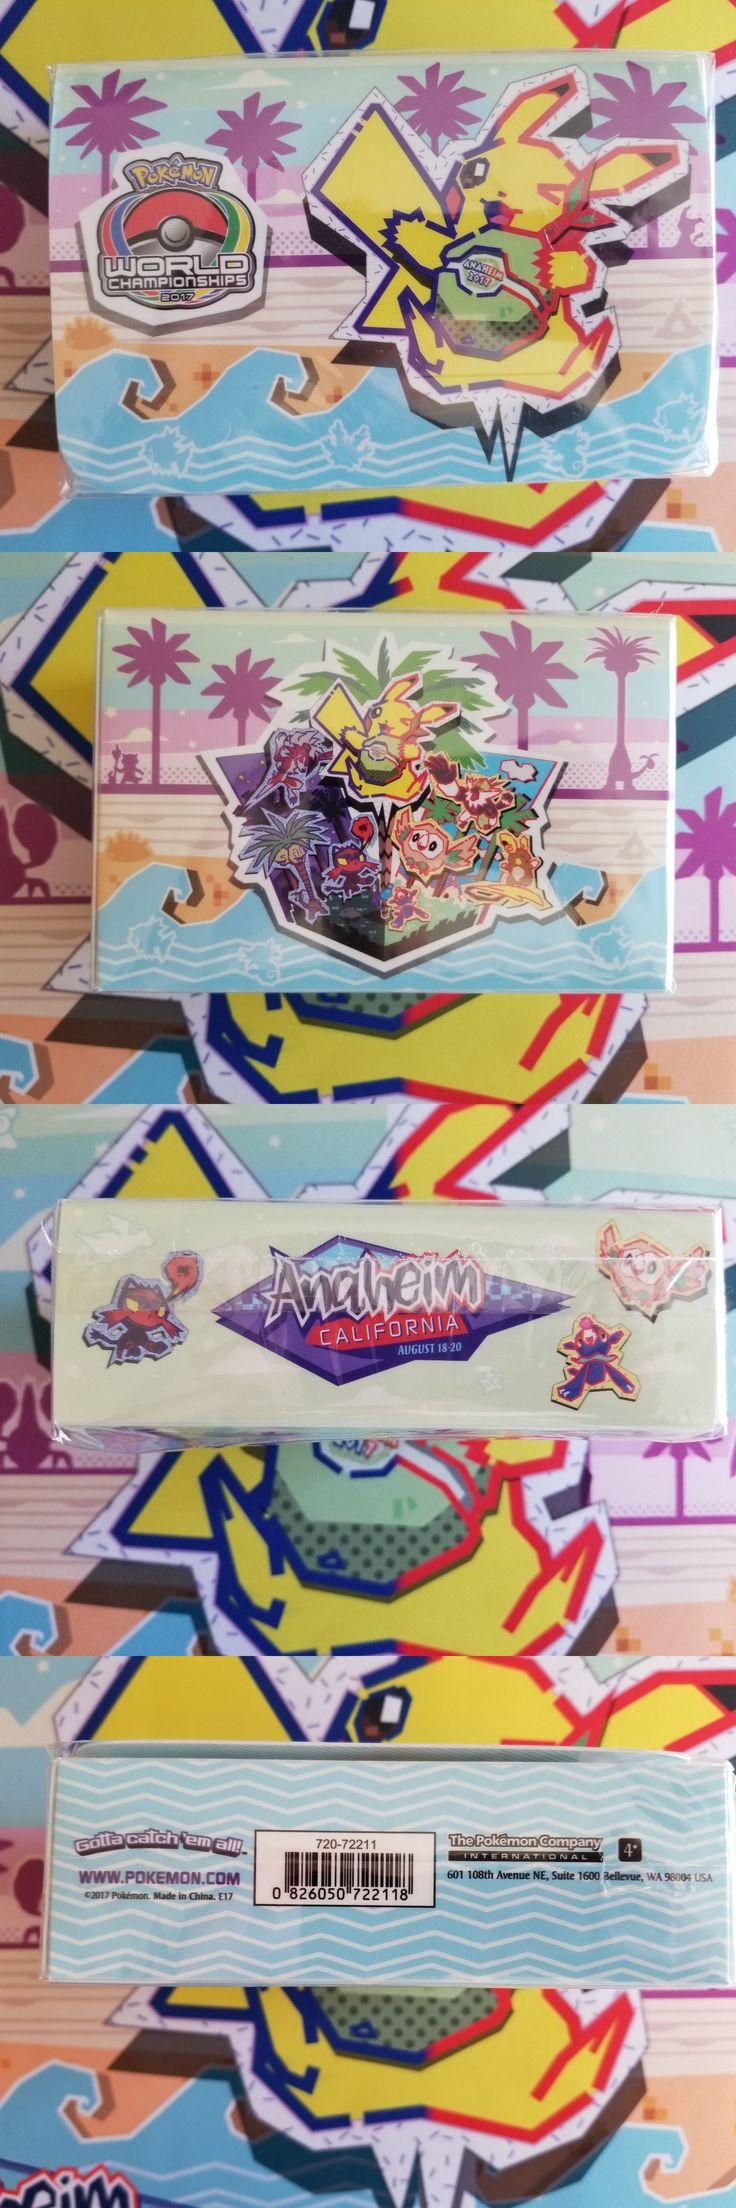 Other Pok mon TCG Items 2608: Pokemon World Championship 2017 Anaheim Double Deck Box Pokemon Tcg Cards! -> BUY IT NOW ONLY: $46 on eBay!